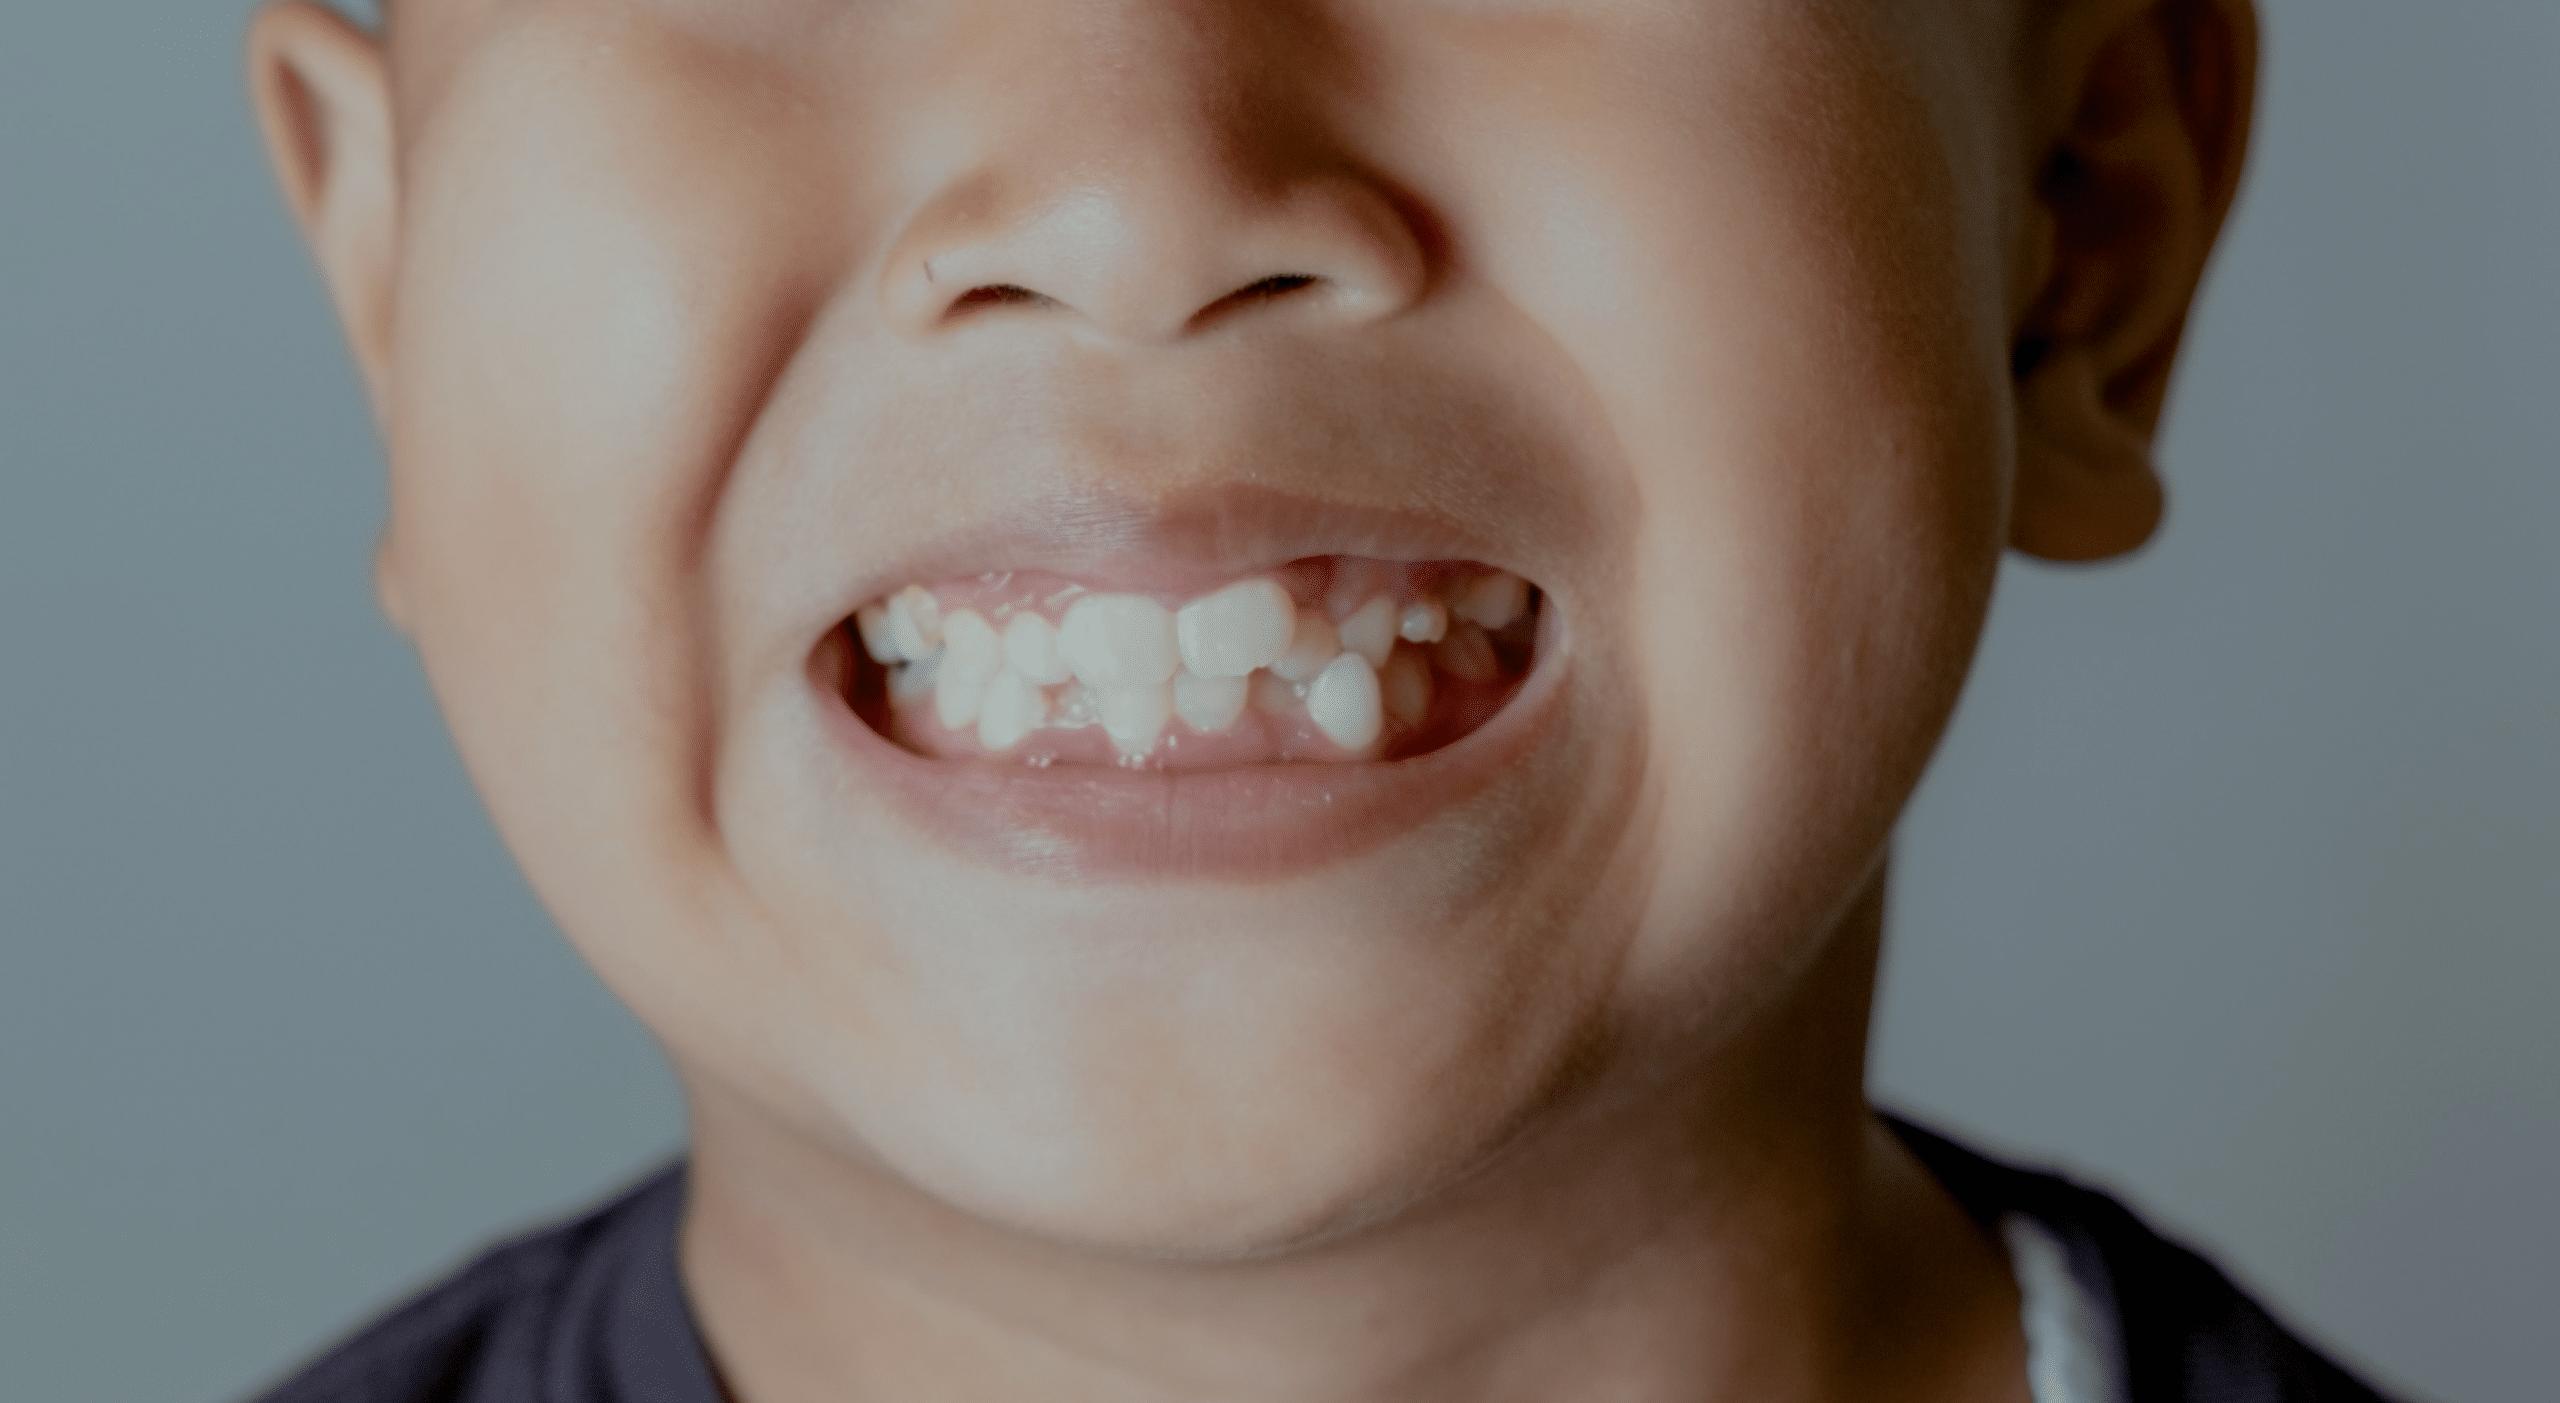 The Dental Risks of Having Crooked Teeth